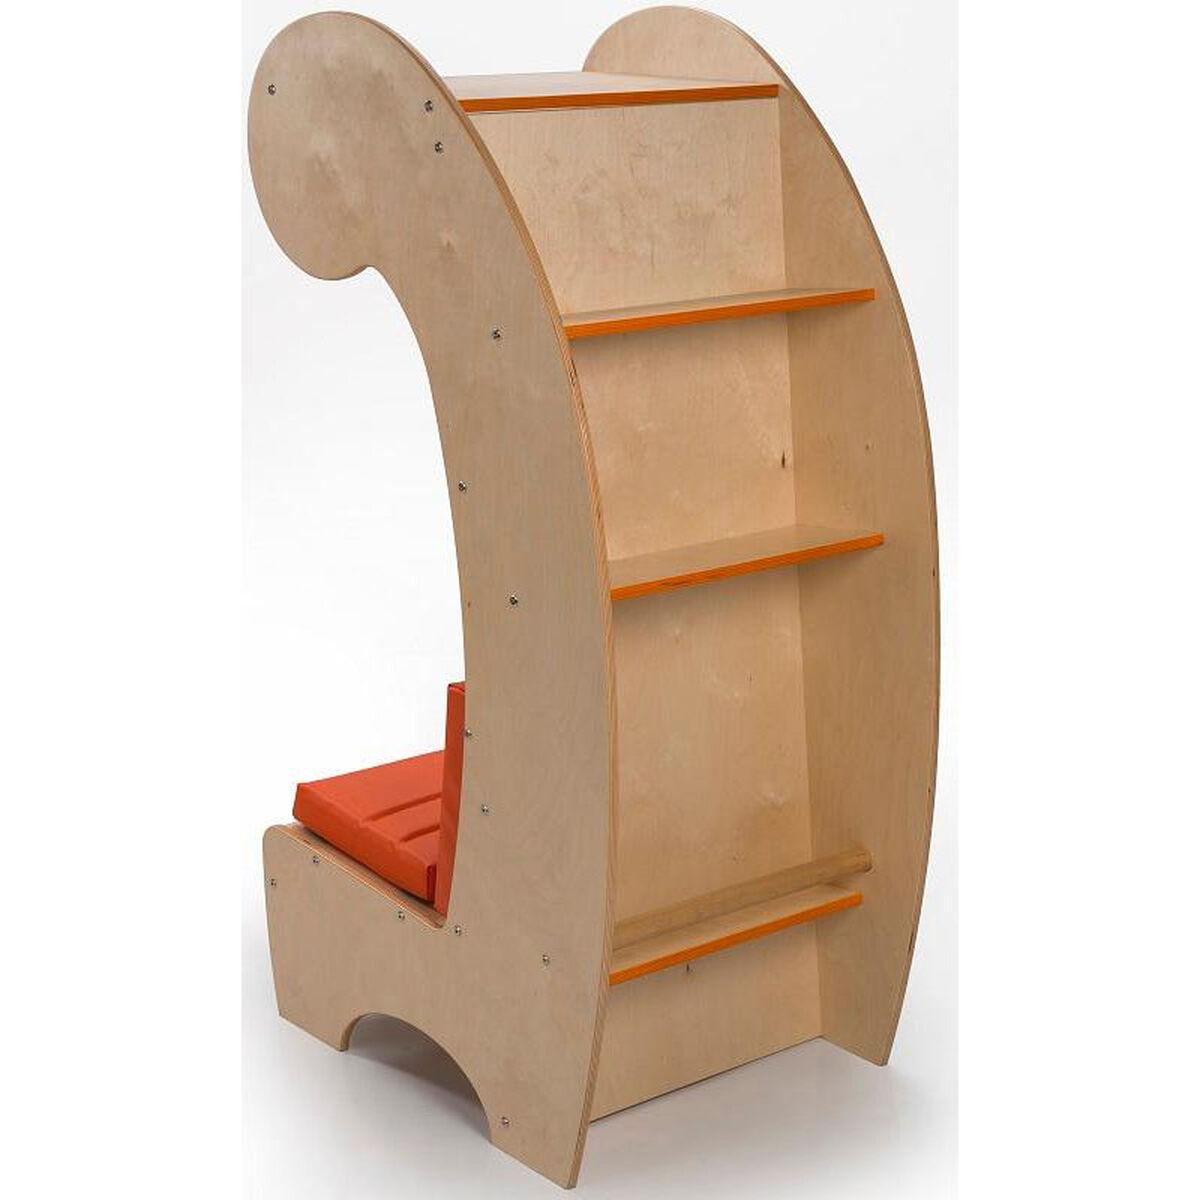 wood fi lcd rustic wooden light bookshelf storage plasma orange bookcases solid jual curve stylish bs tv led stands hi oak in racks bookcase